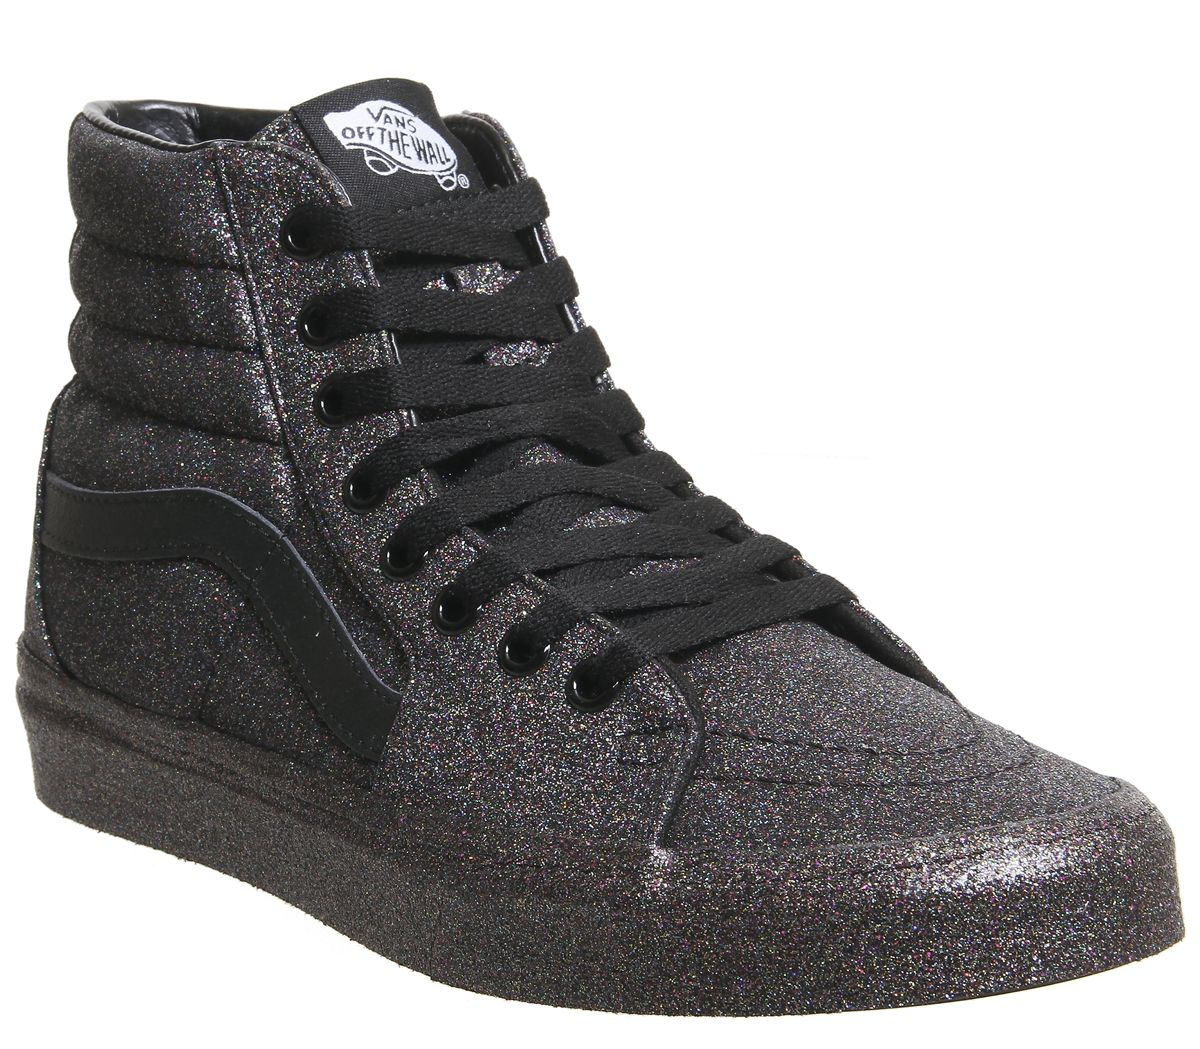 ed82dc88fe3 Vans Sk8 Hi Trainers Black Black Rainbow Glitter - Hers trainers